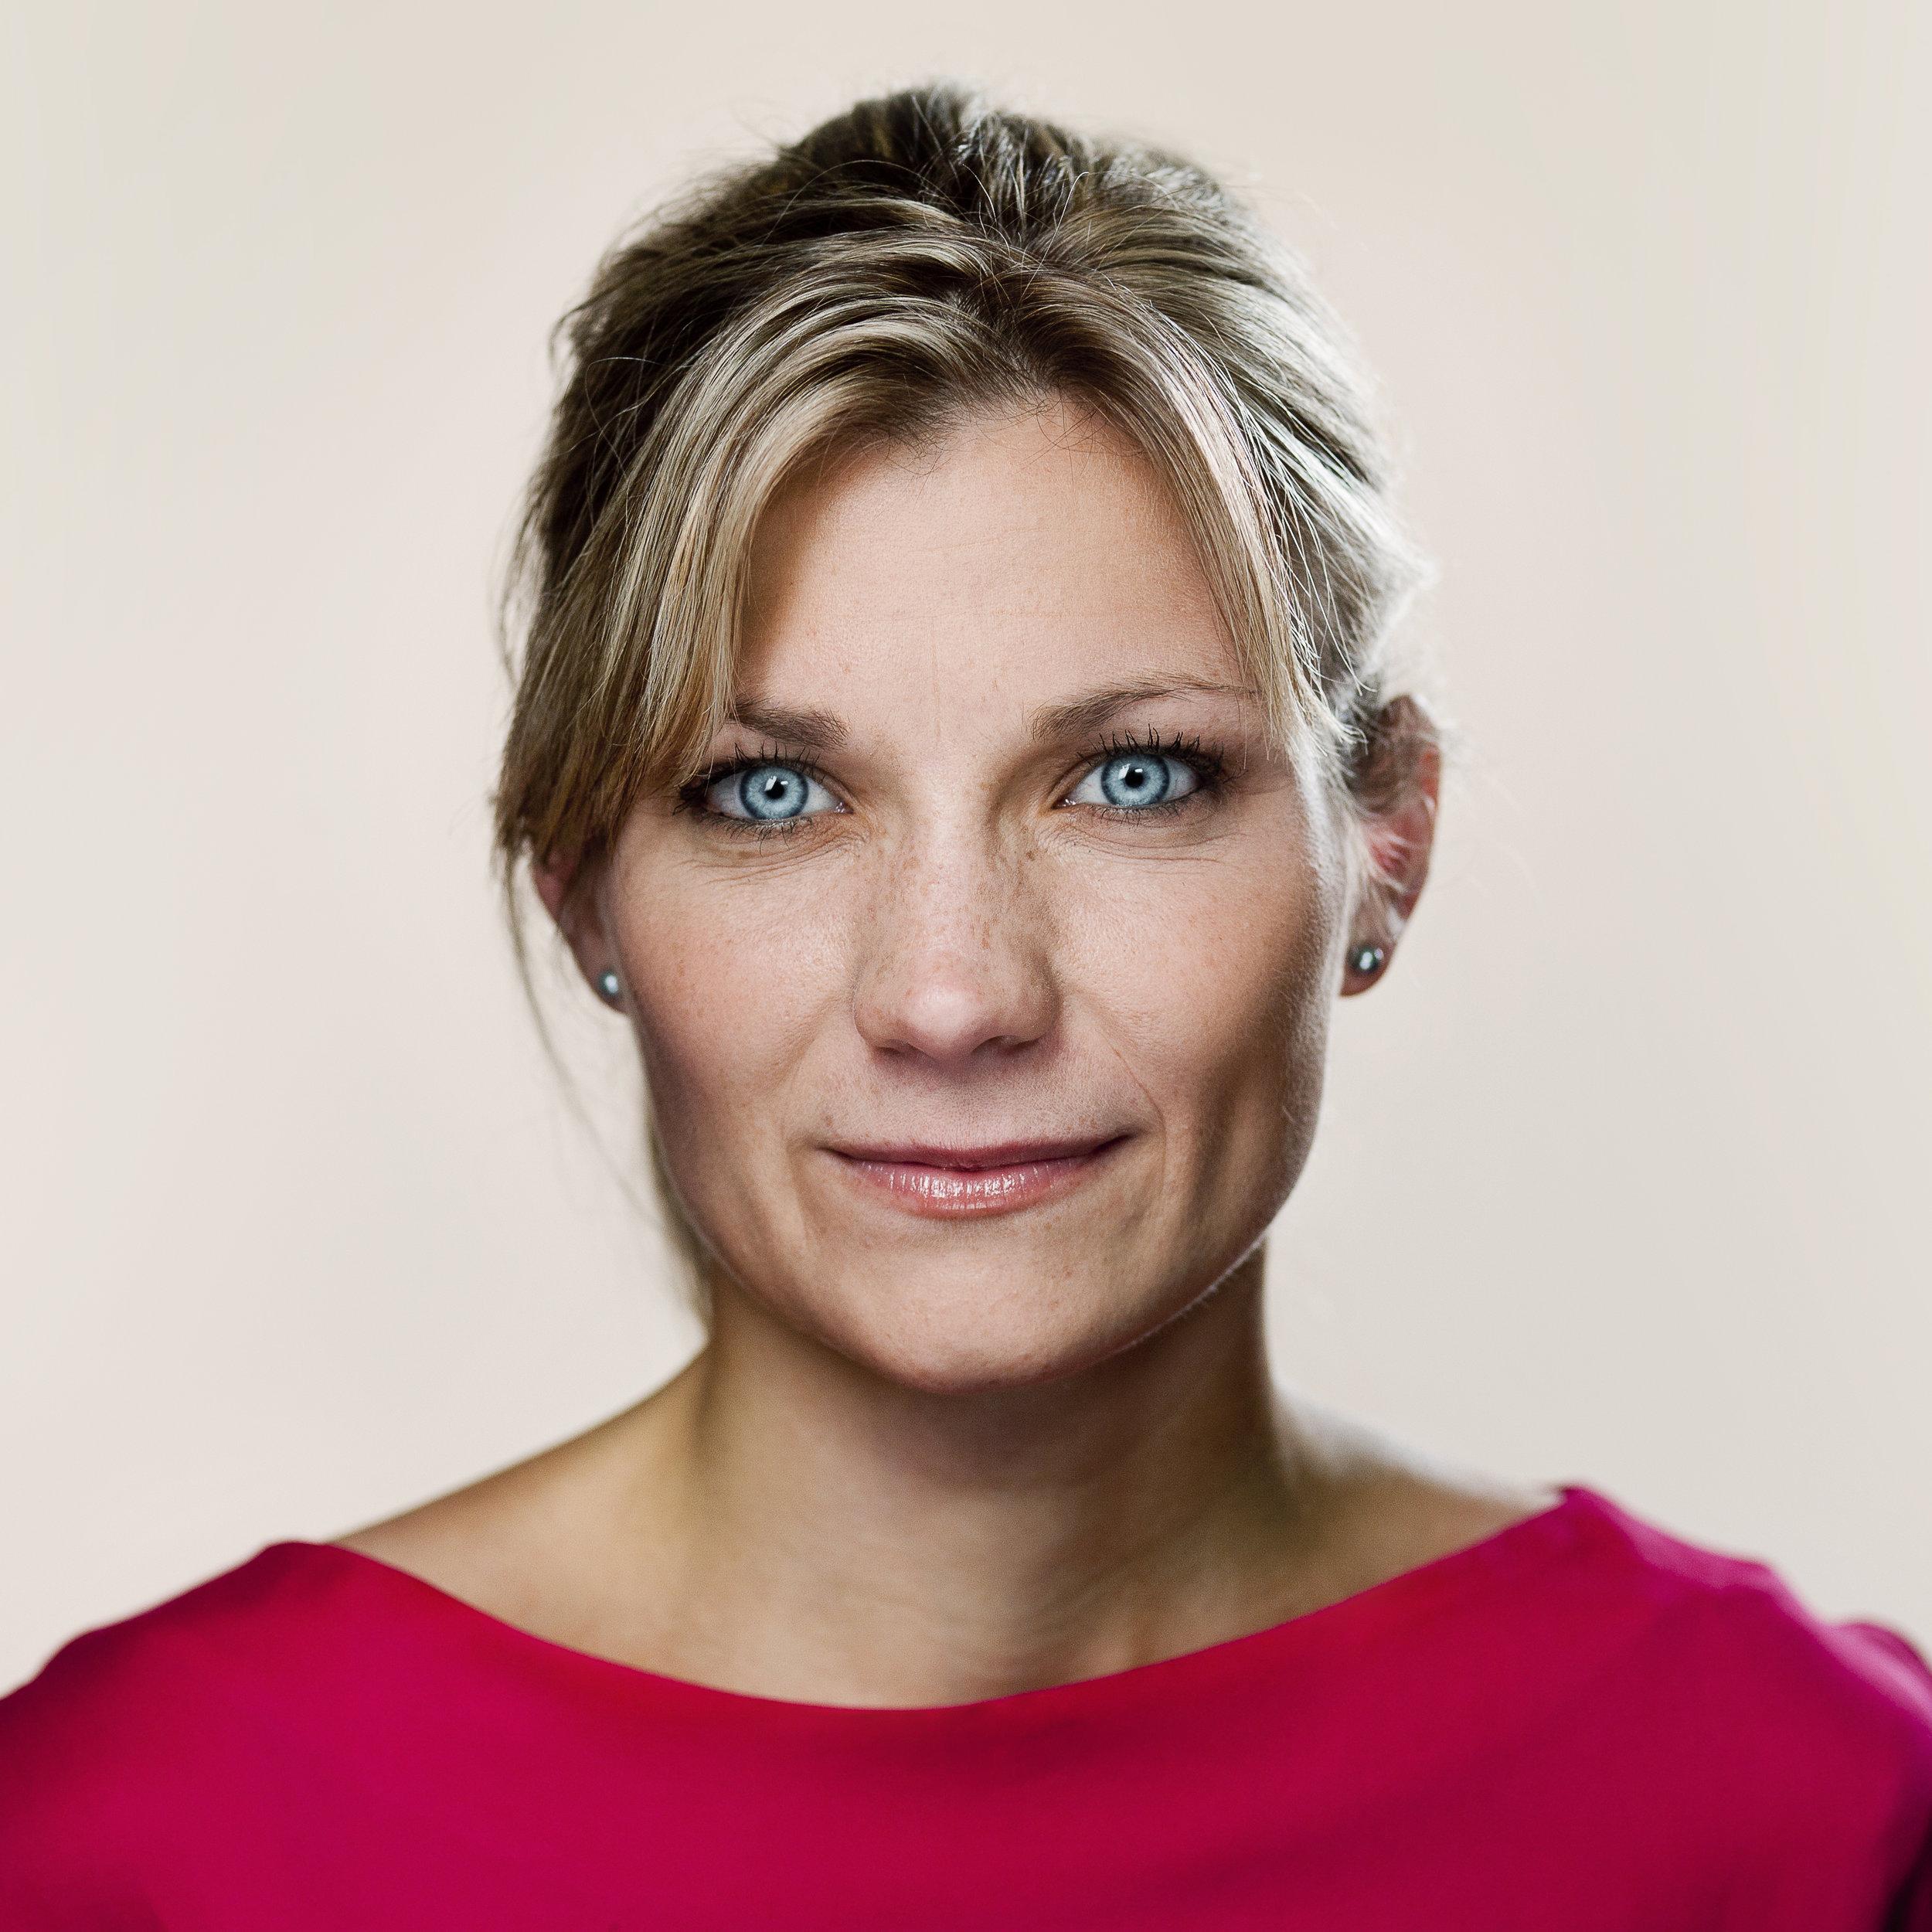 Fotograf: Steen Brogaard